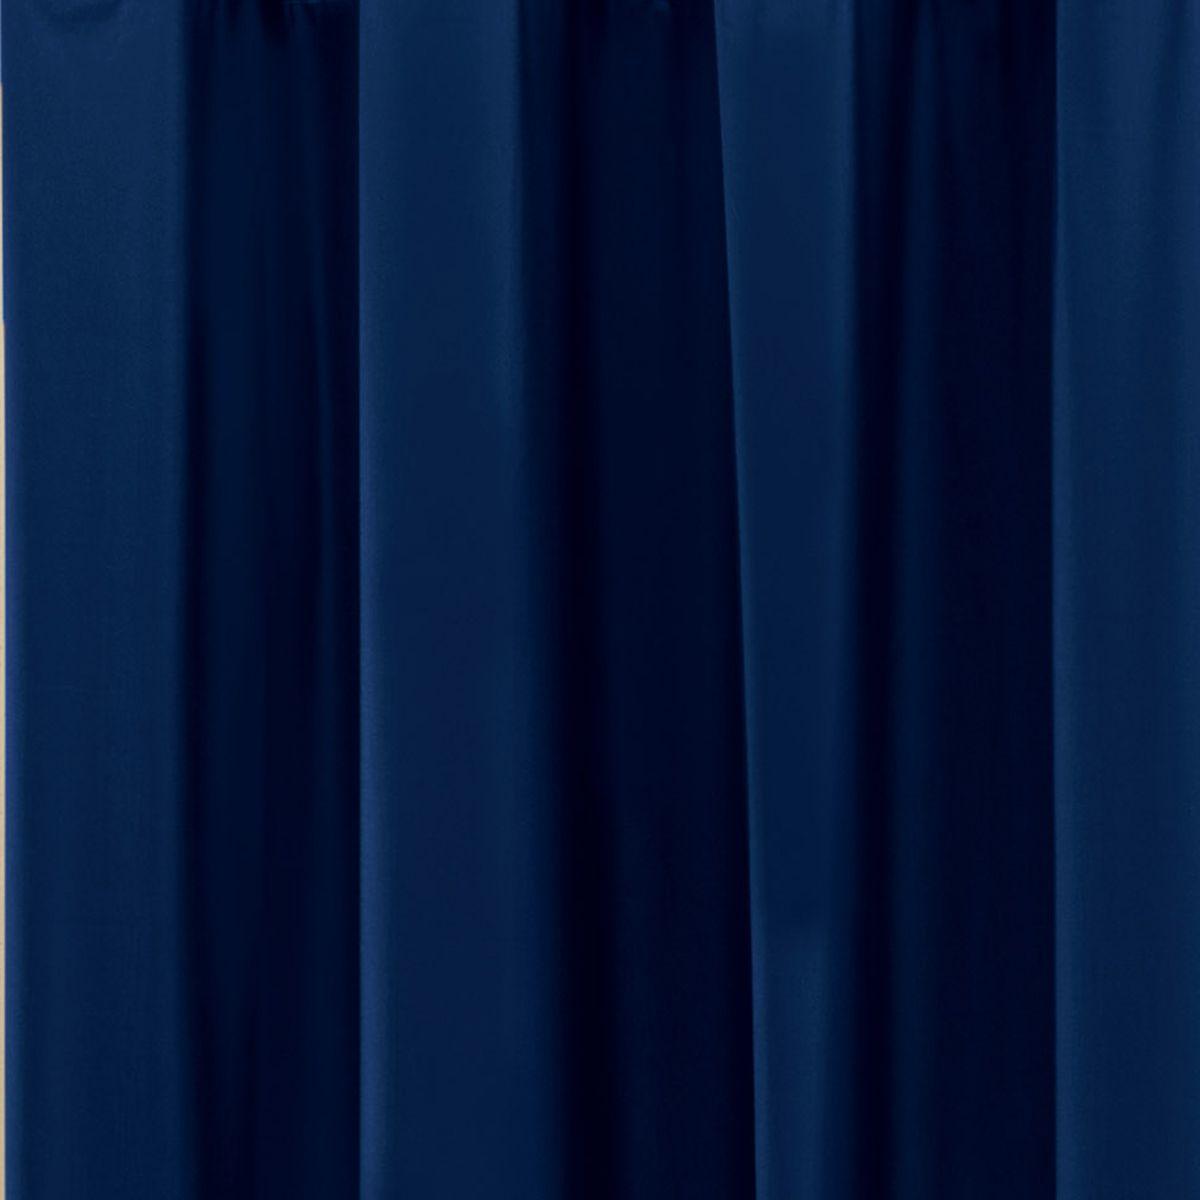 Cortina Blackout PVC Azul Marinho Corta Luz 2,20m X 1,30m